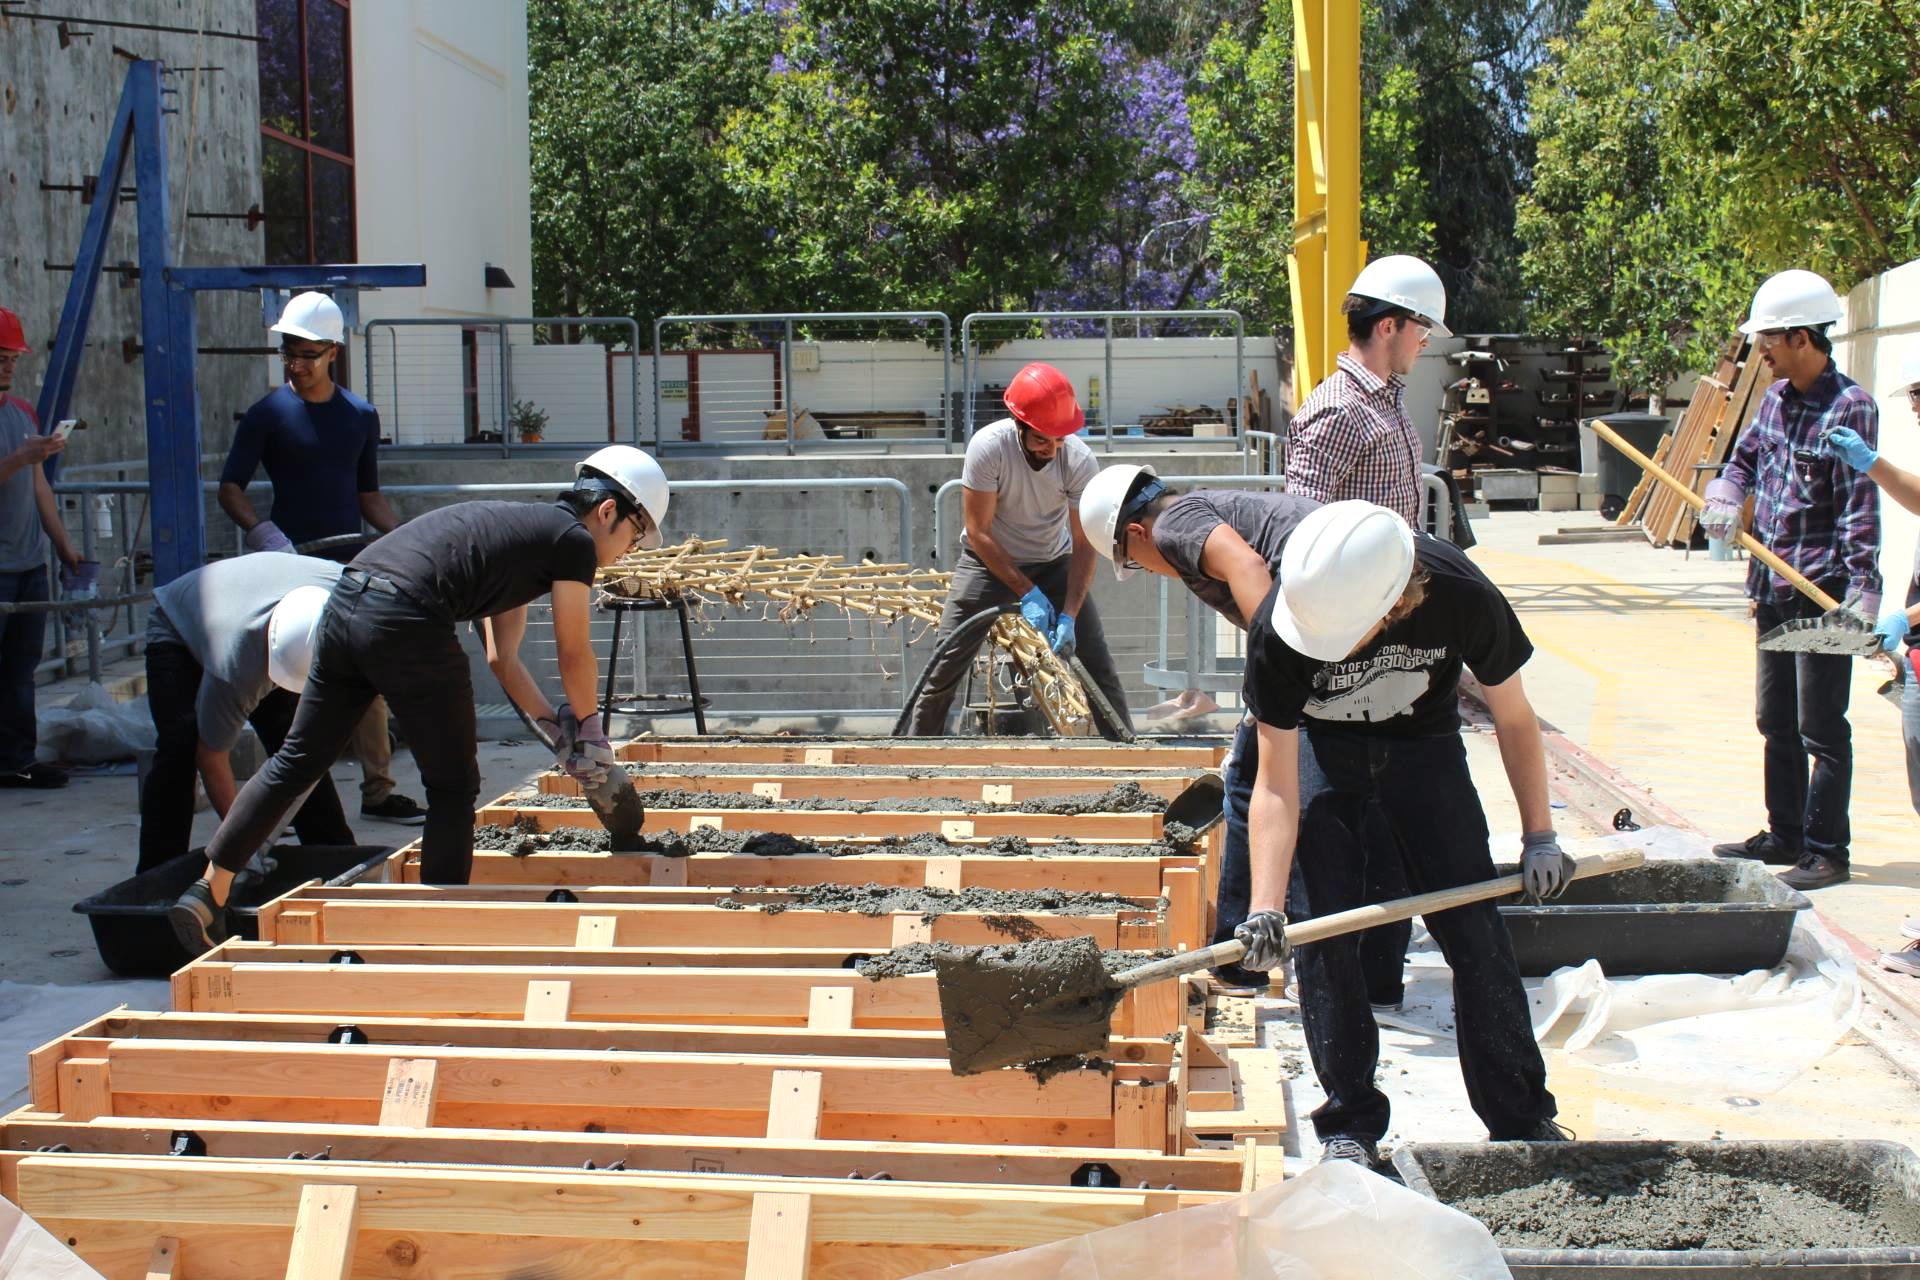 CEE151C: Reinforced Concrete Design – Concrete Beam Testing